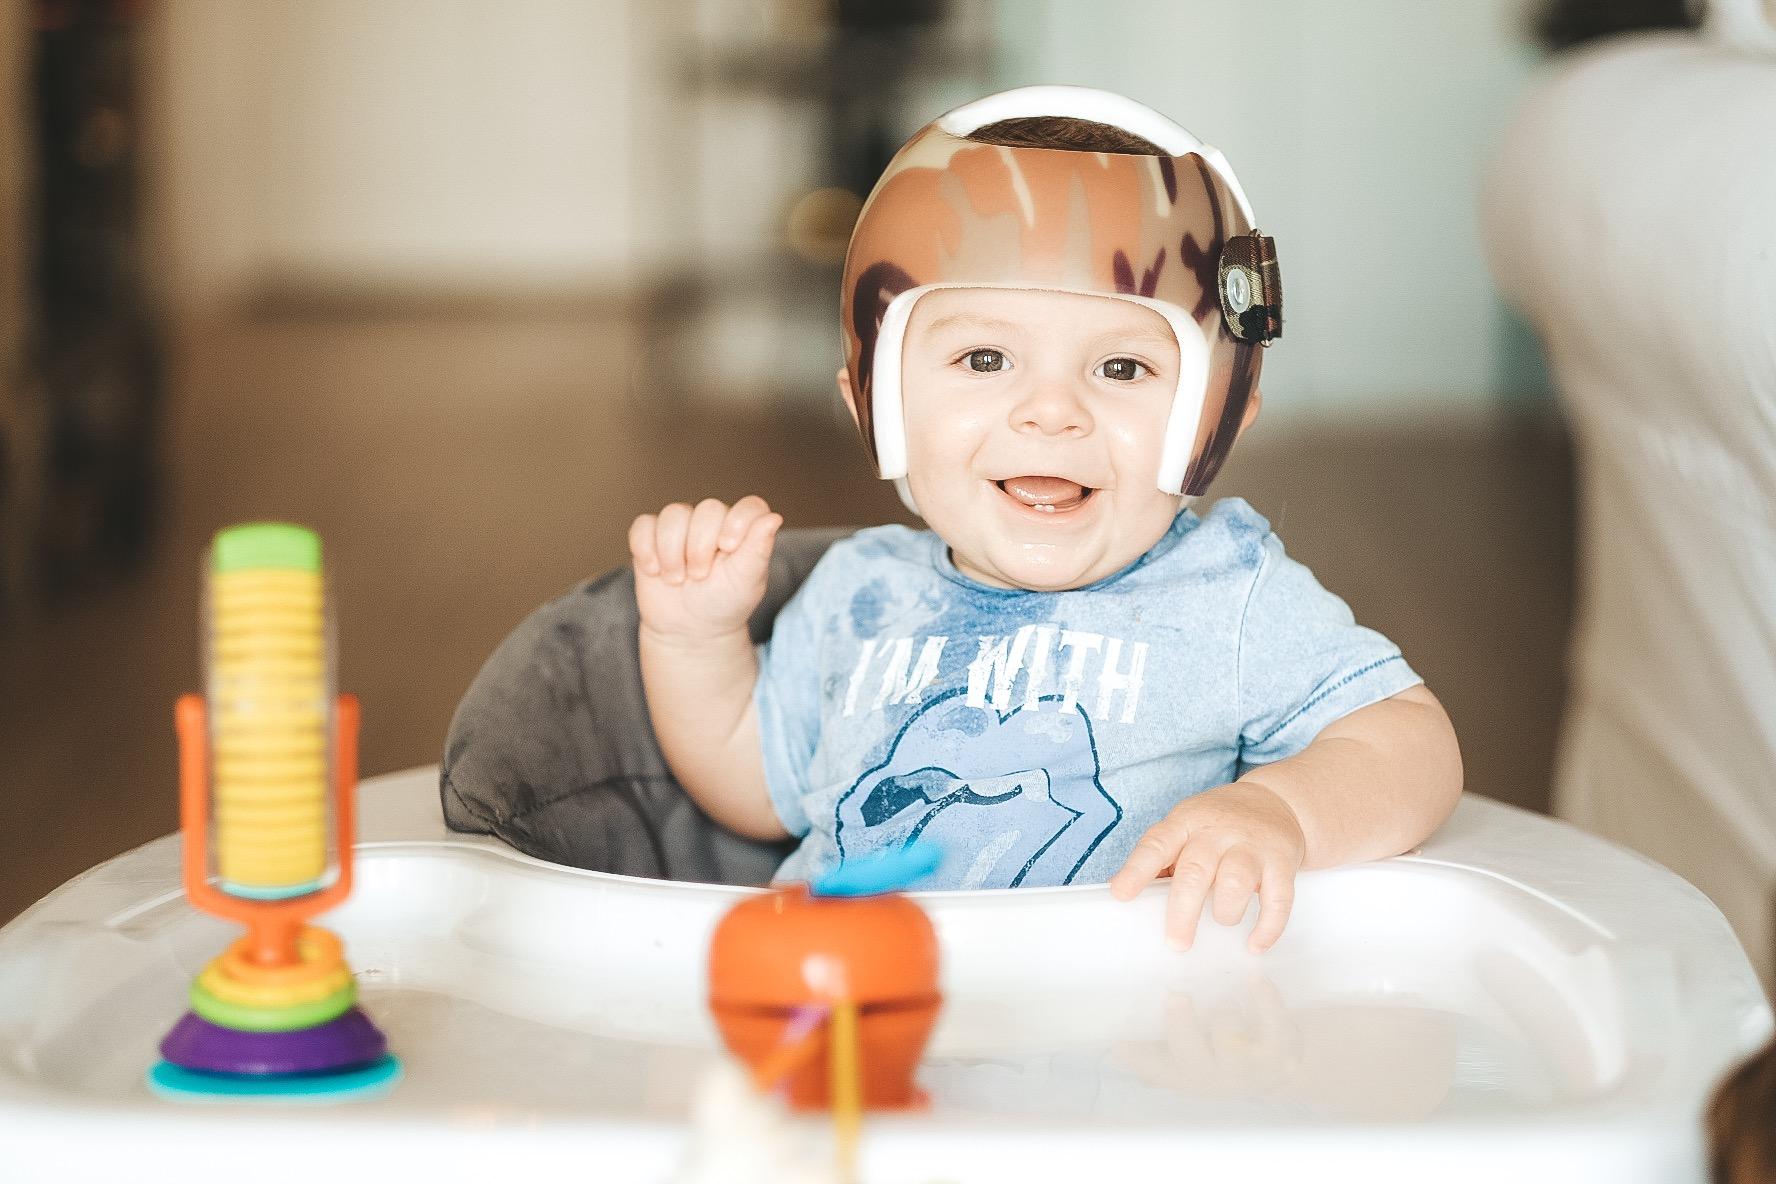 Jett Jones, 8 Months Old. Joovy Spoon Walker.  Camo Starband Helmet. Helmet treatment for Plagiocephaly aka flat head.